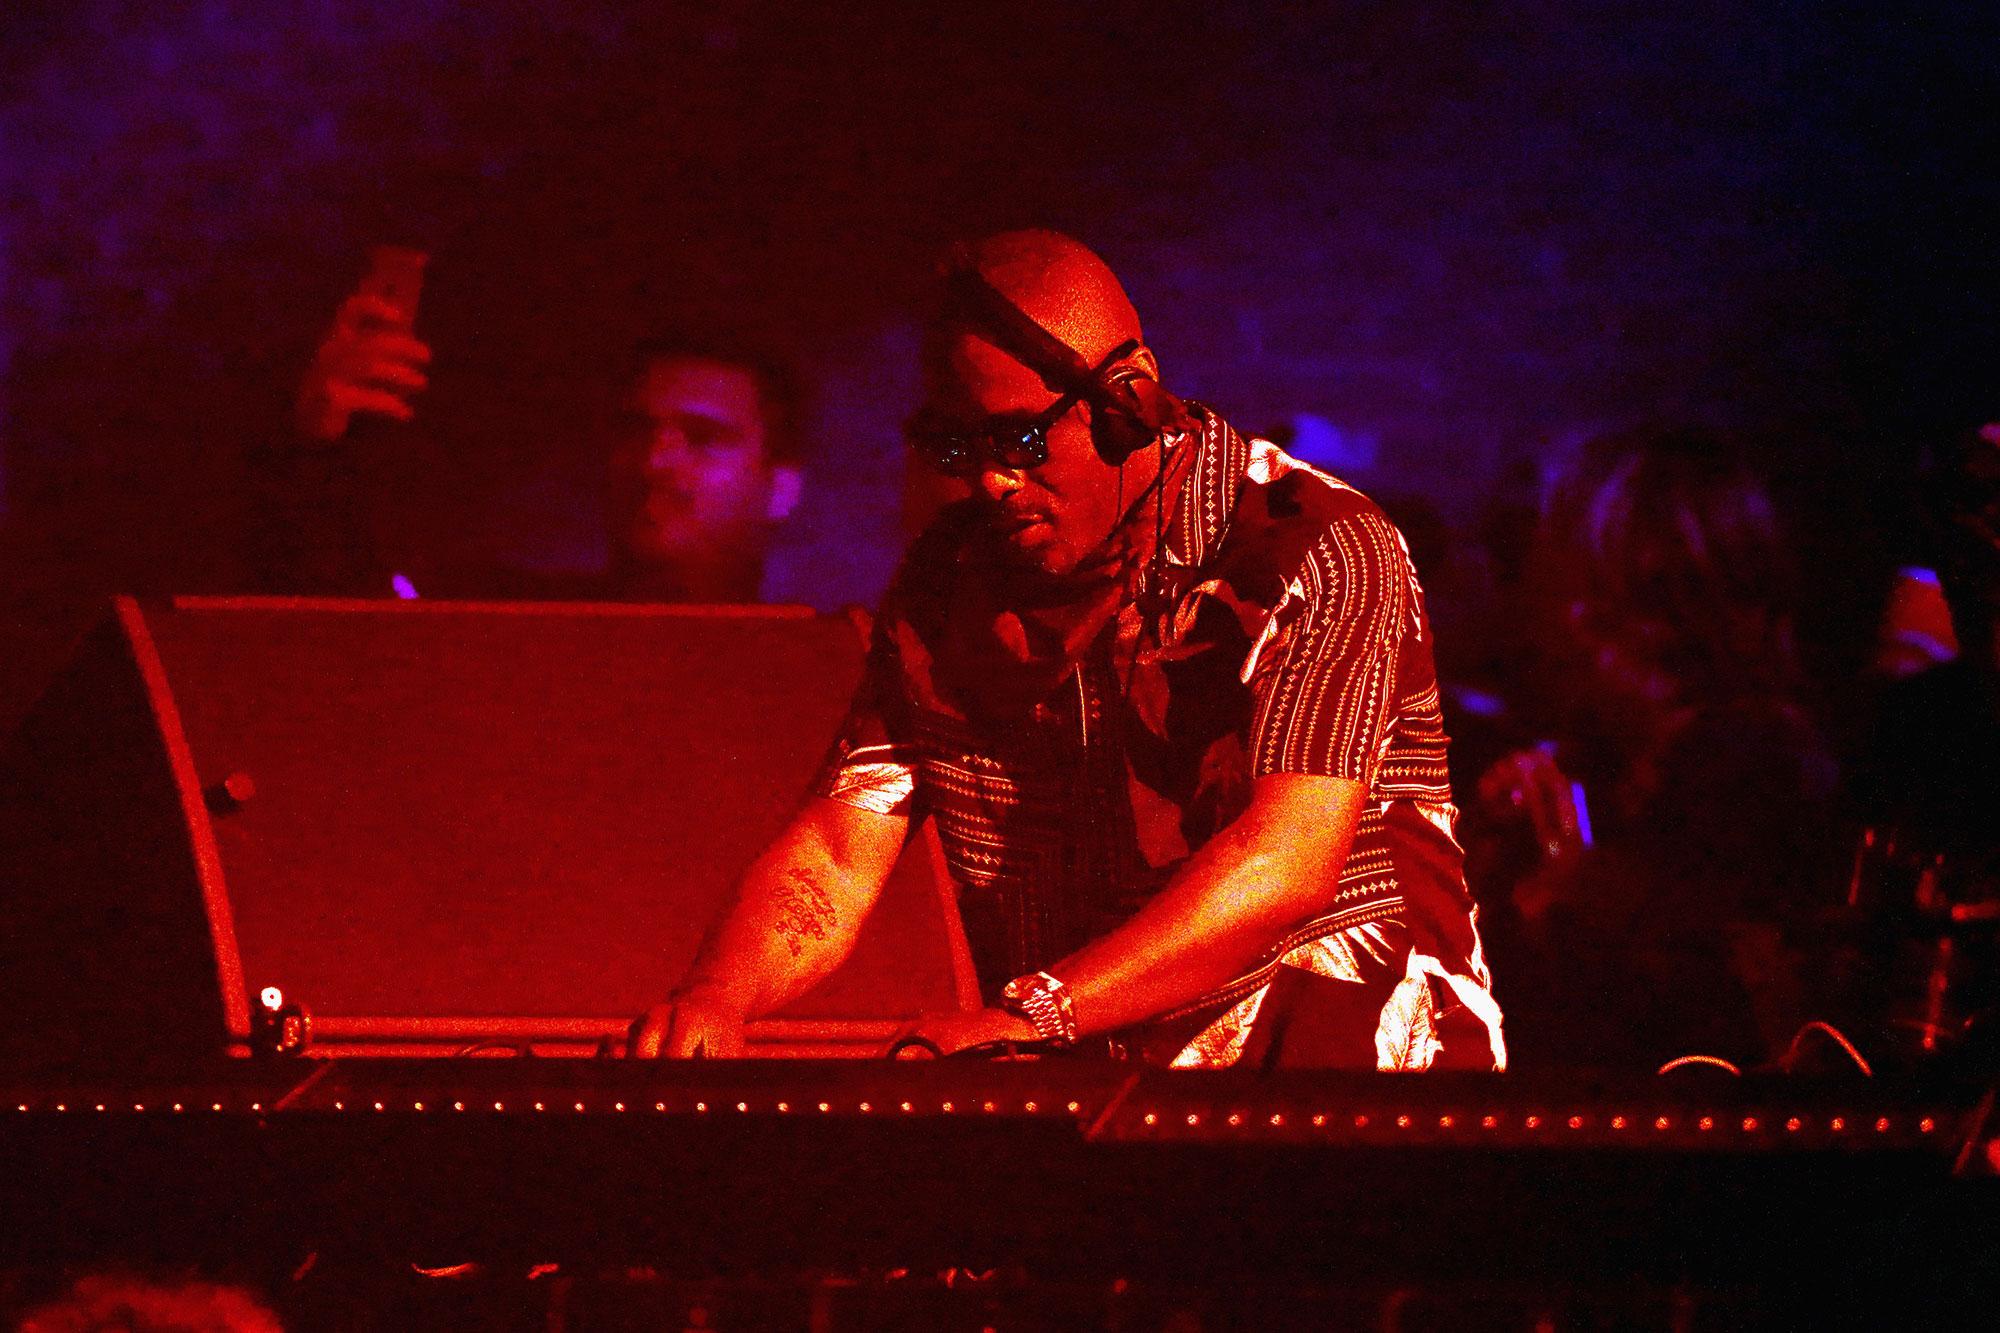 Idris Elba DJ Coachella - Idris Elba performs at Yuma Tent during the 2019 Coachella Valley Music And Arts Festival on April 13, 2019 in Indio, California.